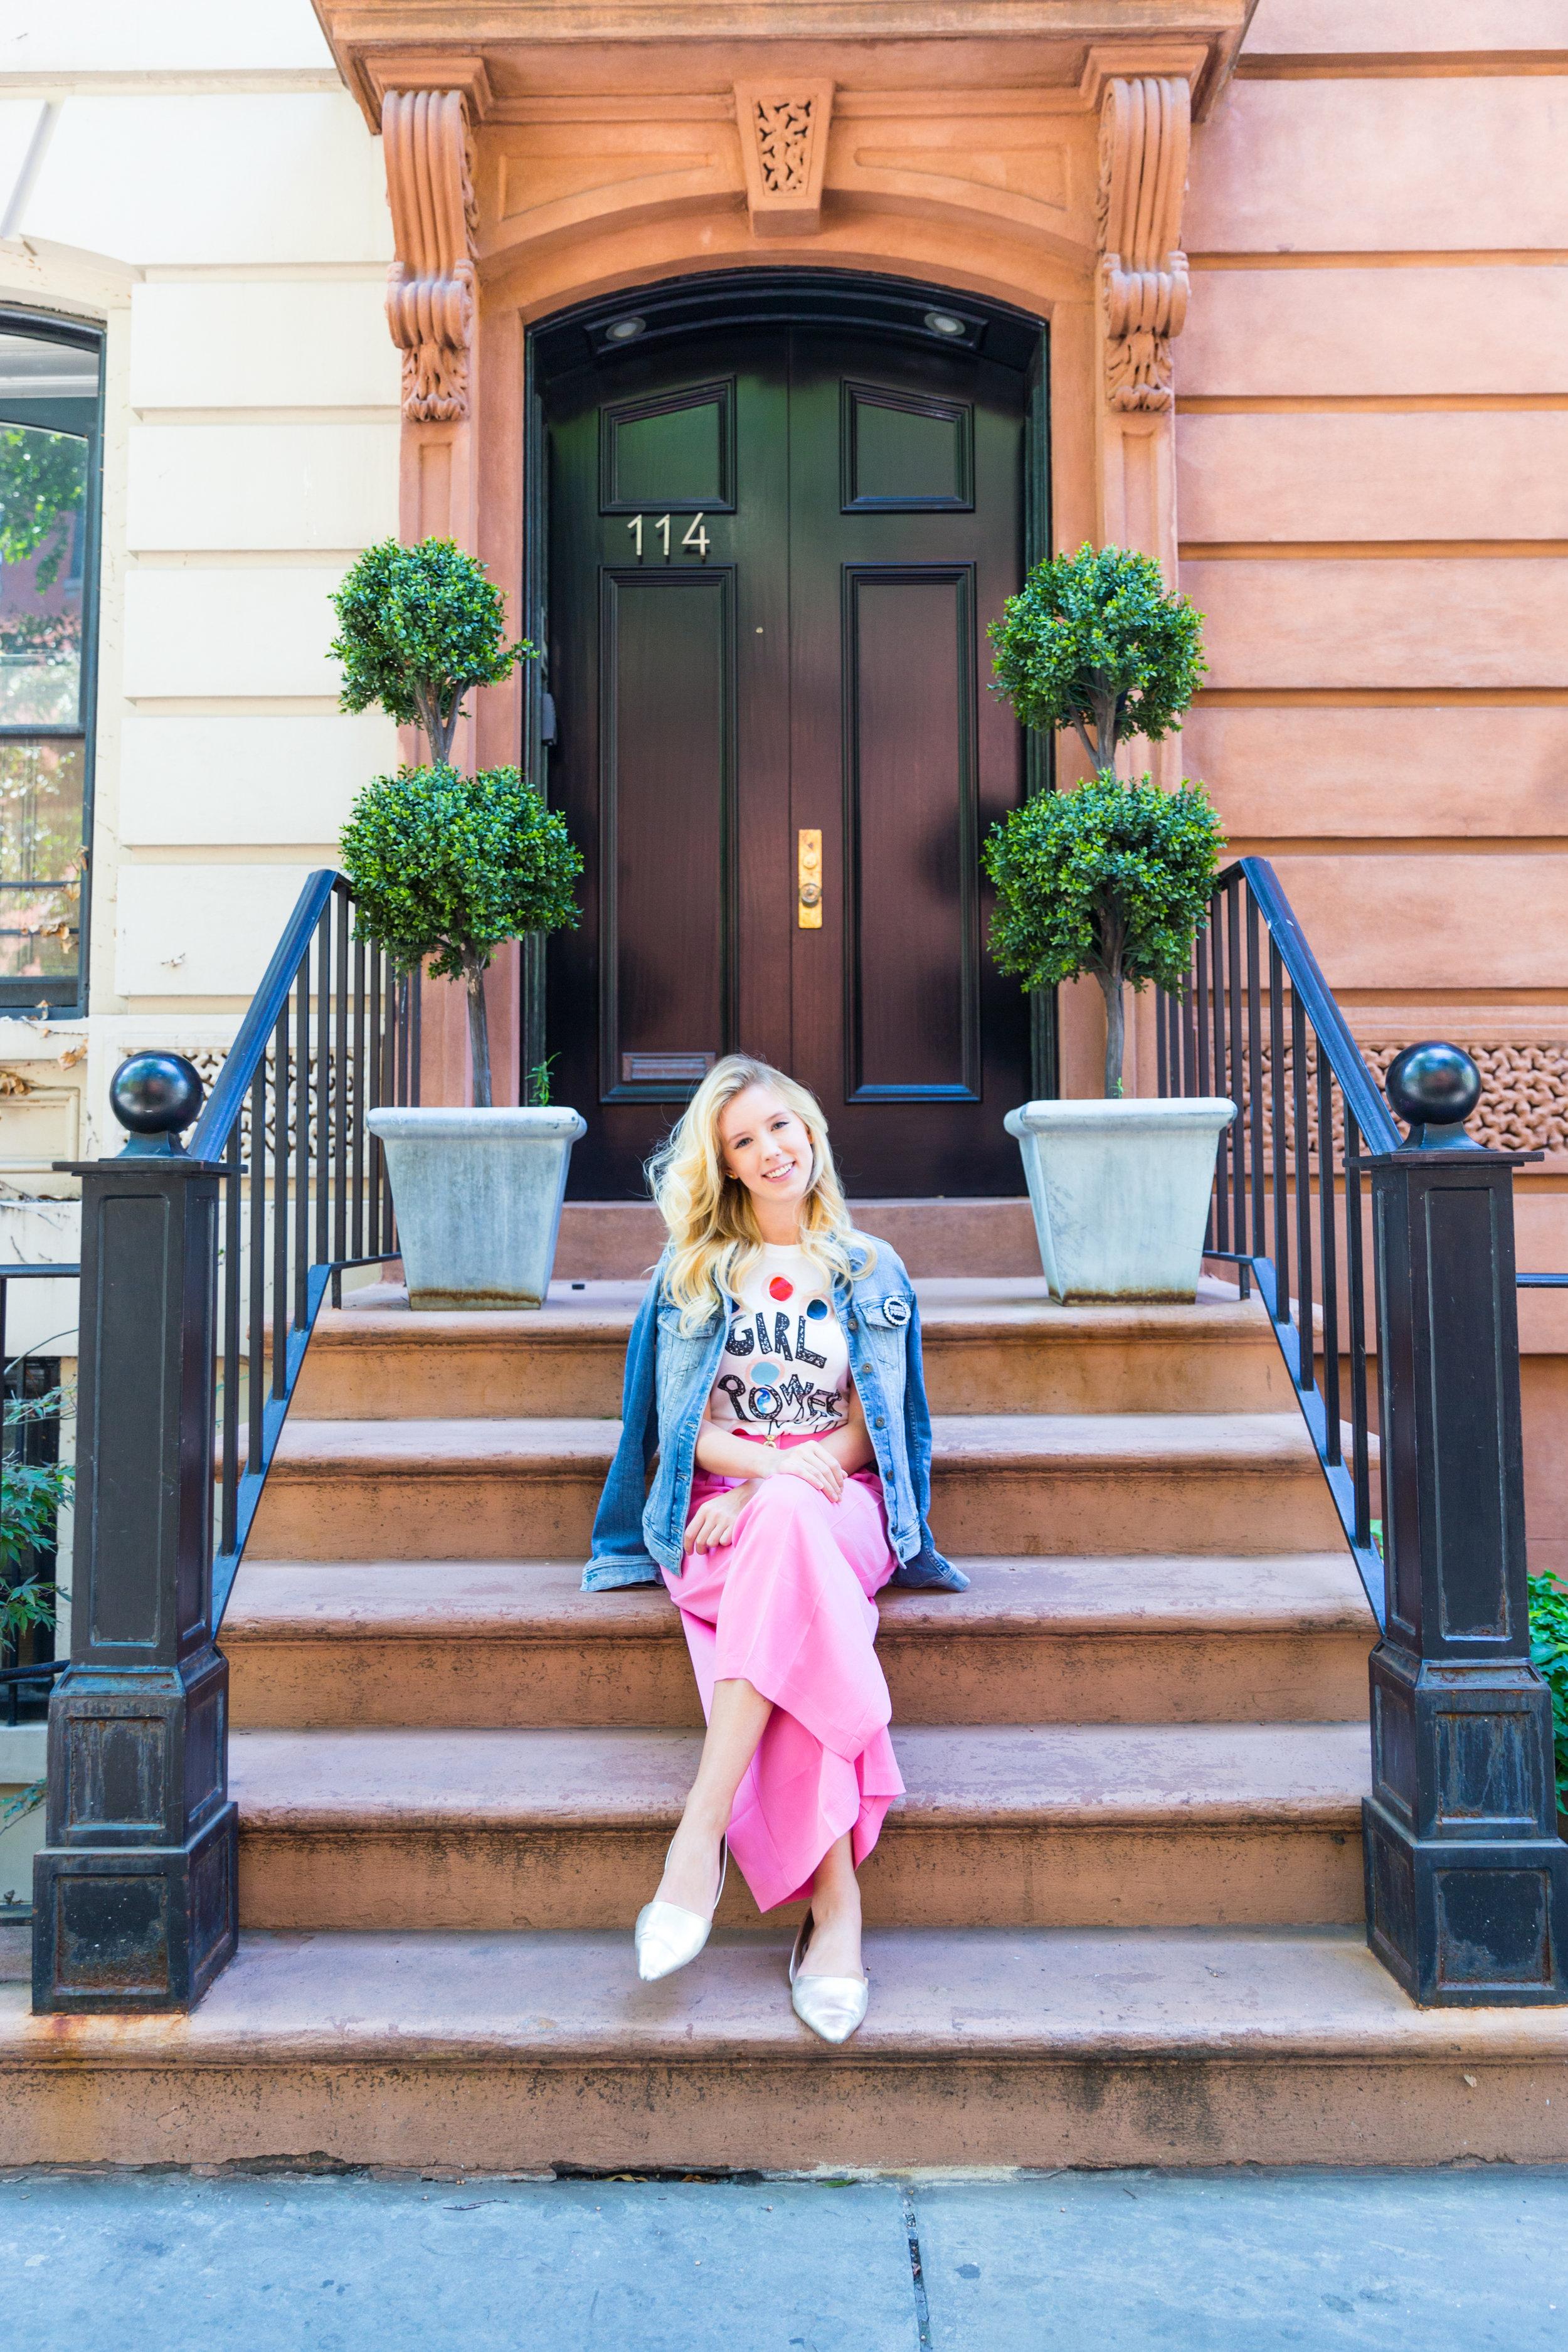 Summer Ethical Fashion NYC Pink Pants Girl Power Shirt-6.jpg